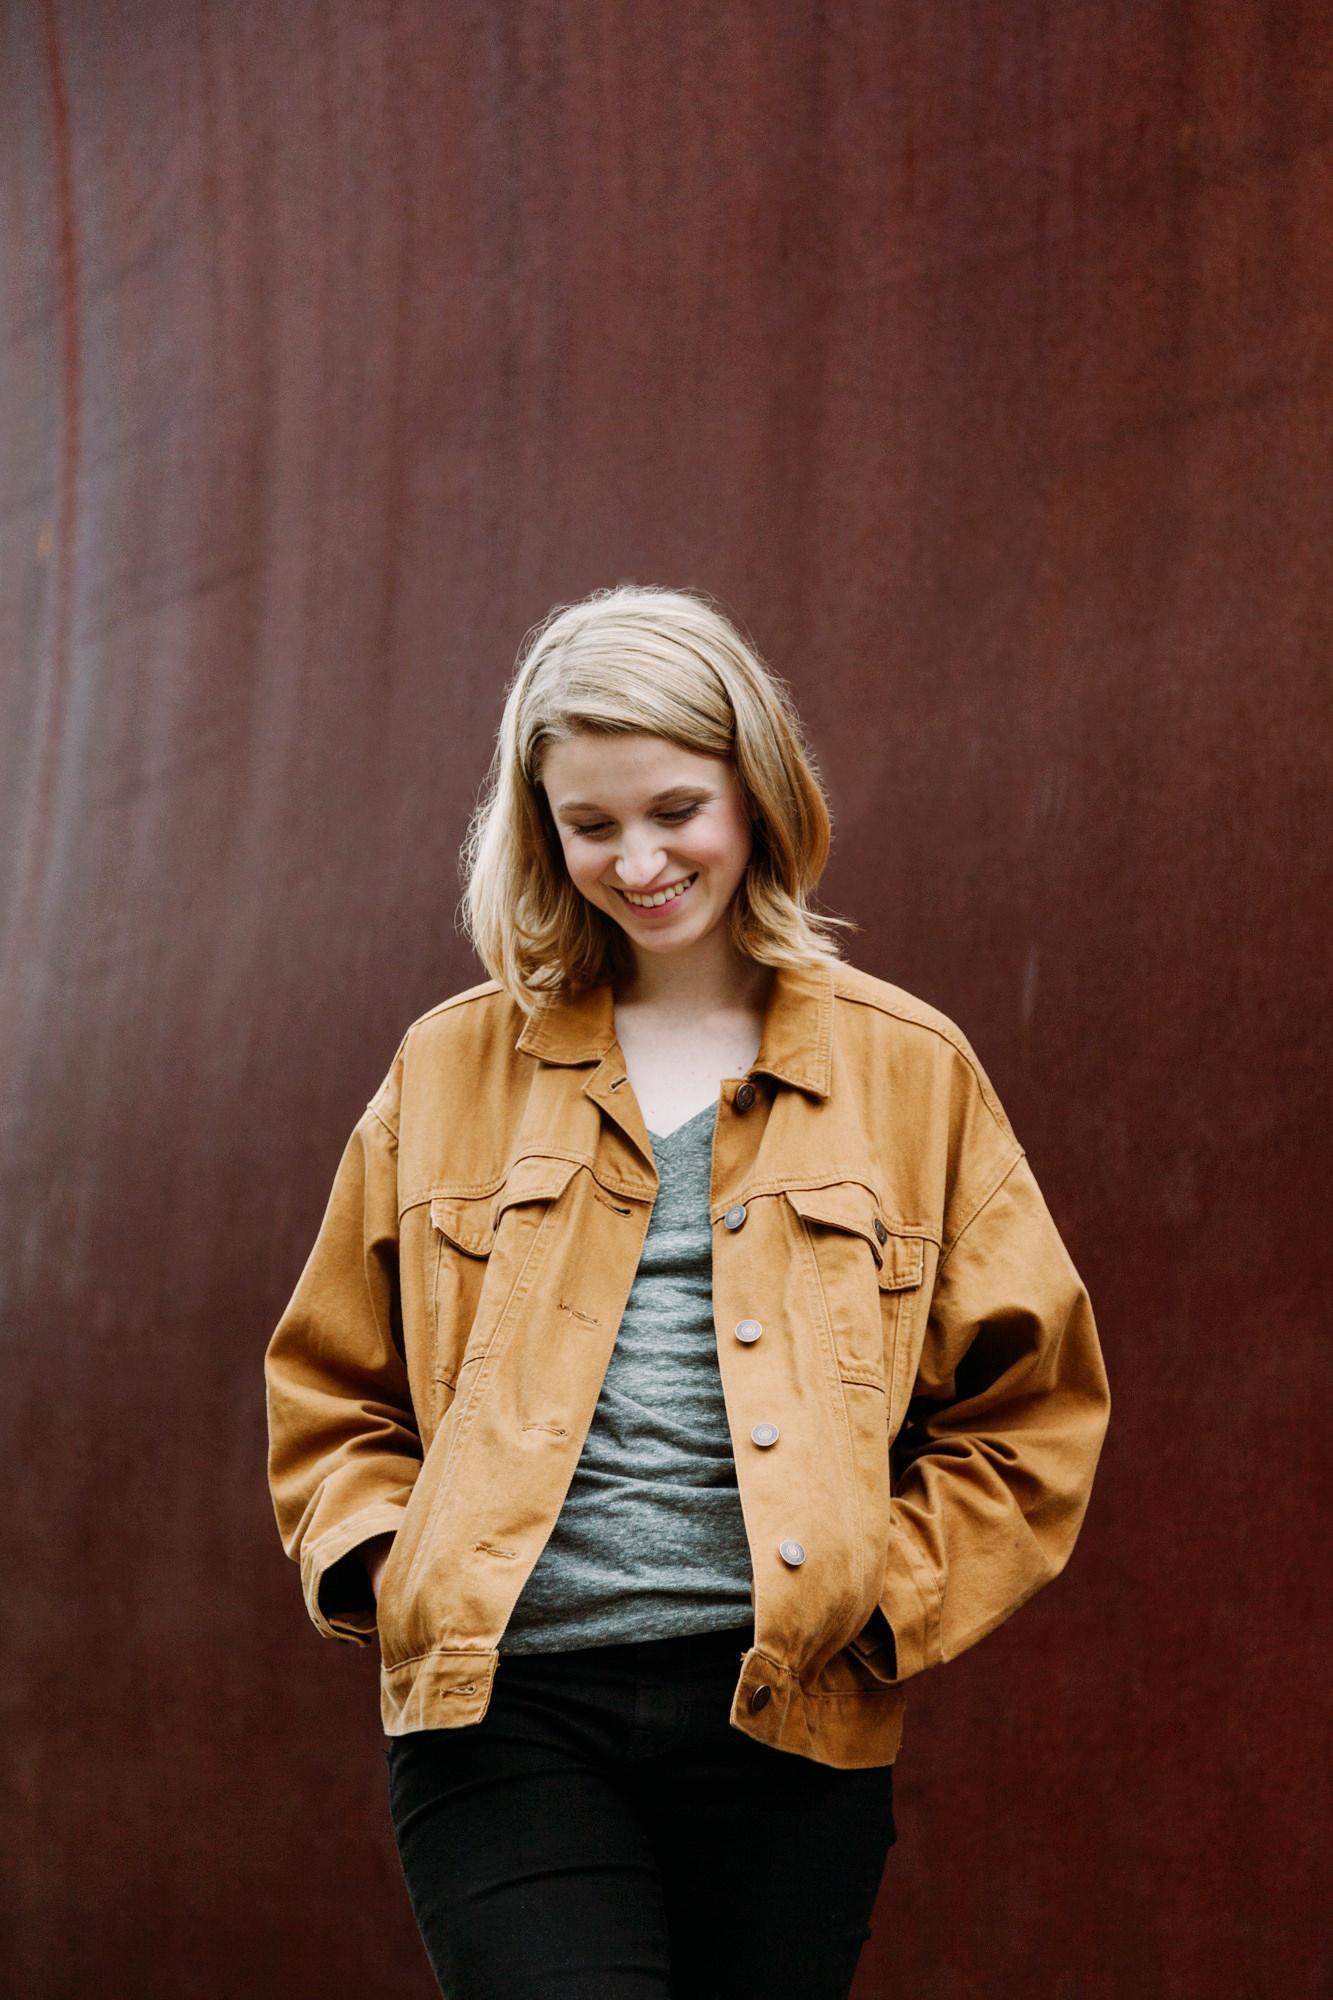 LaurenSenior-HaleyMcLain1.JPG